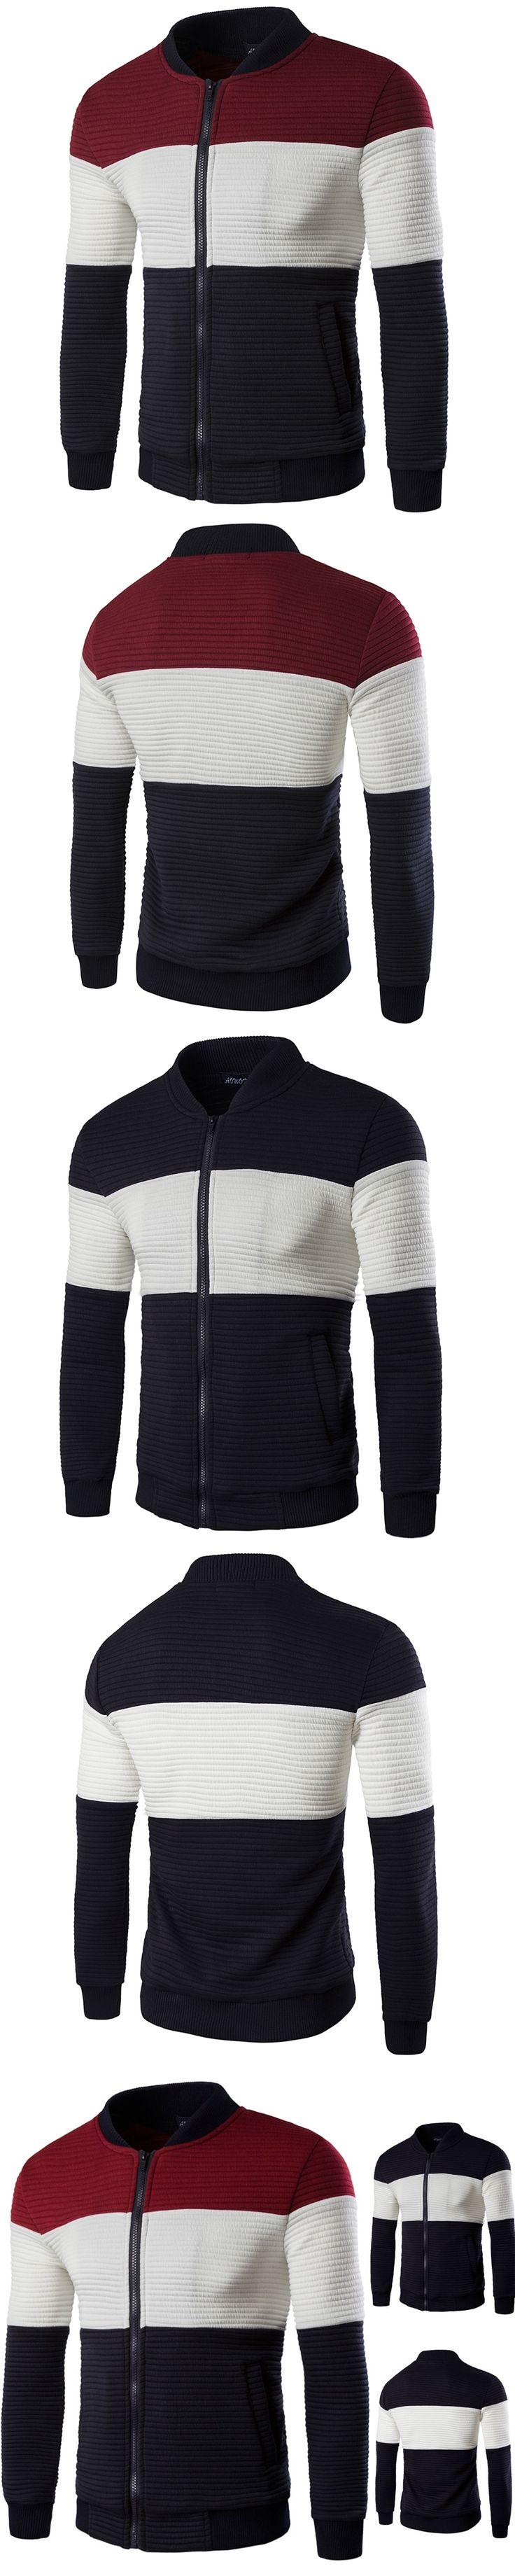 jackets men Spring Autumn New Fashion winter jacket men Casual Cardigan bomber jacket Men's striped jacket zipper placket